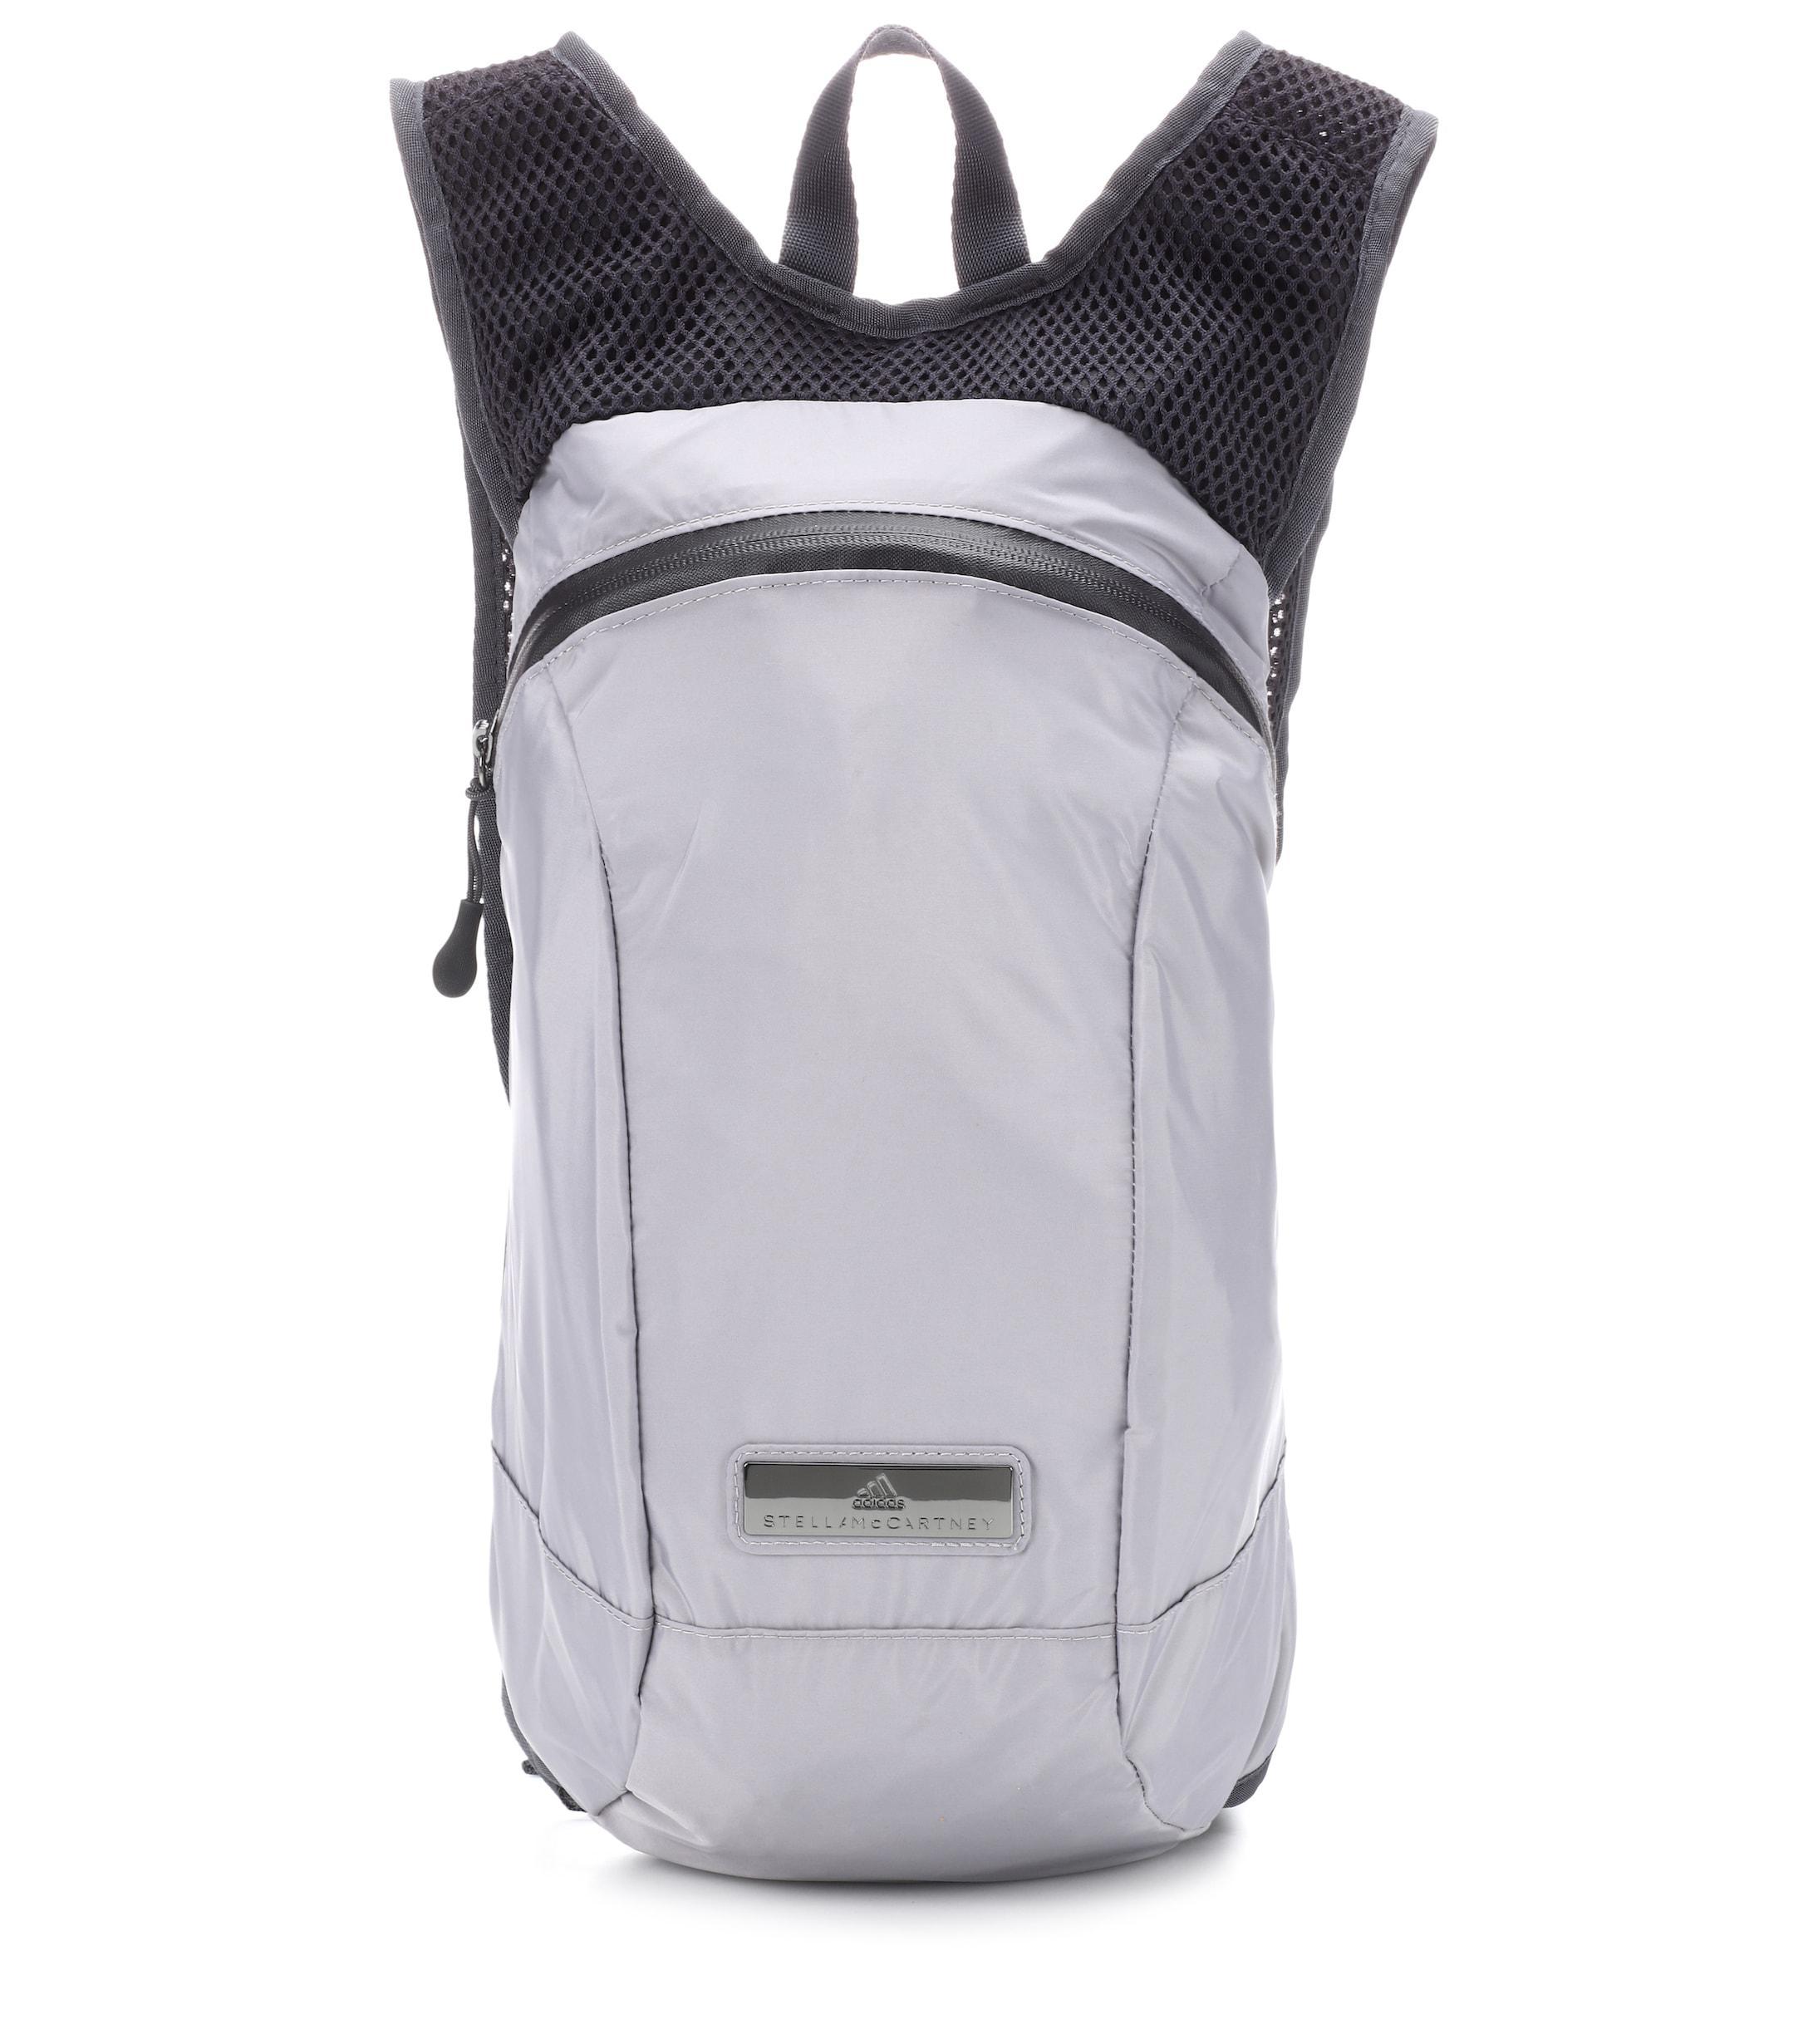 96485cf809 adidas By Stella McCartney. Women s Adizero Backpack